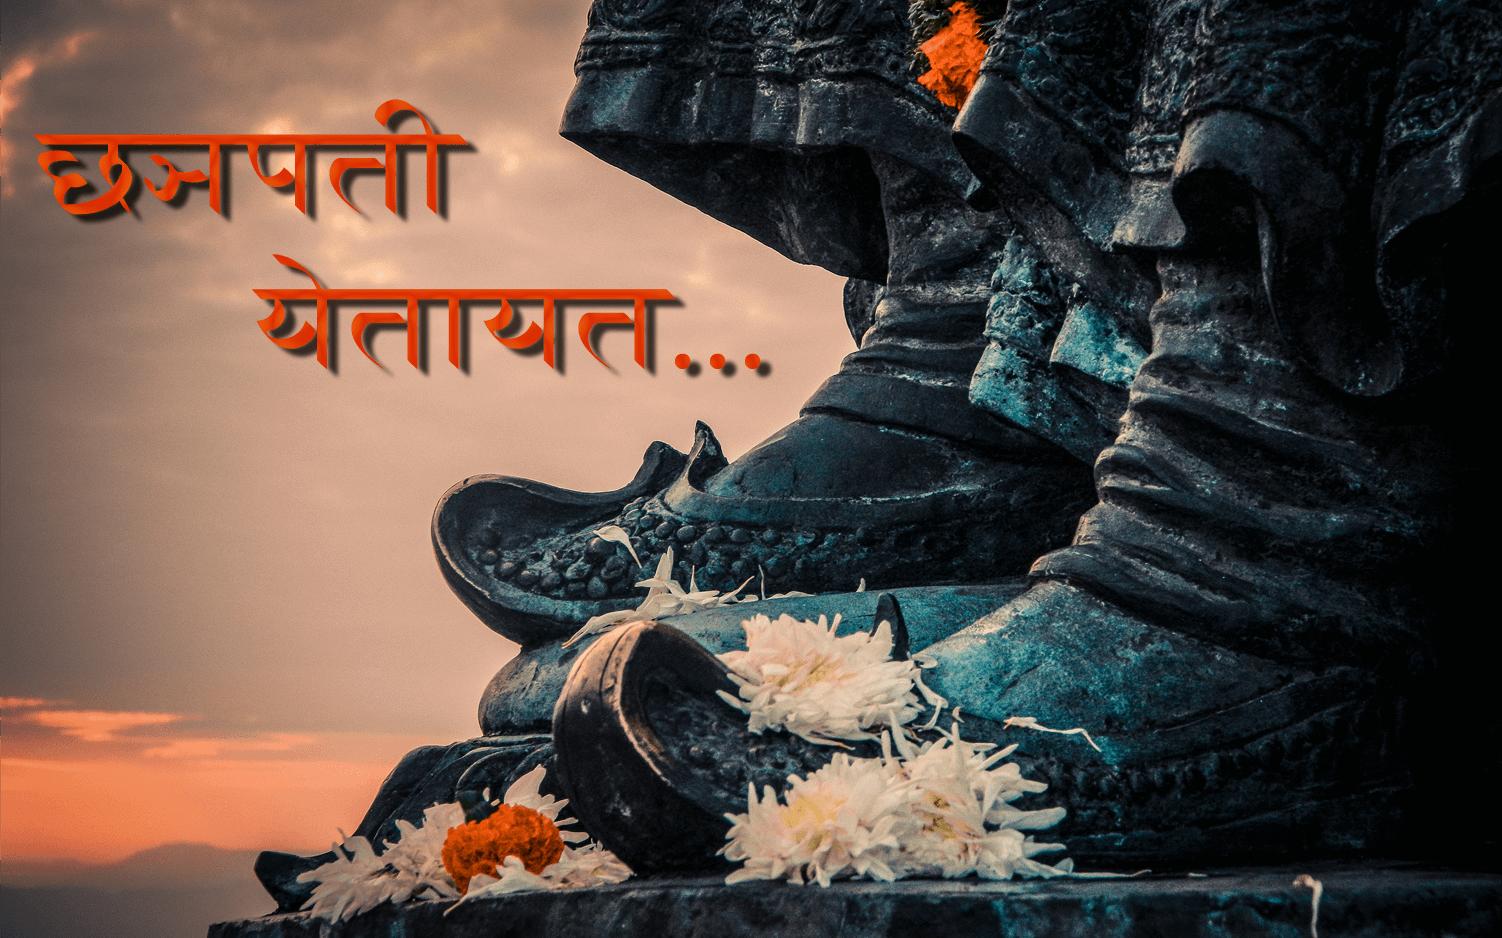 Chhatrapati Shivaji Jayanti